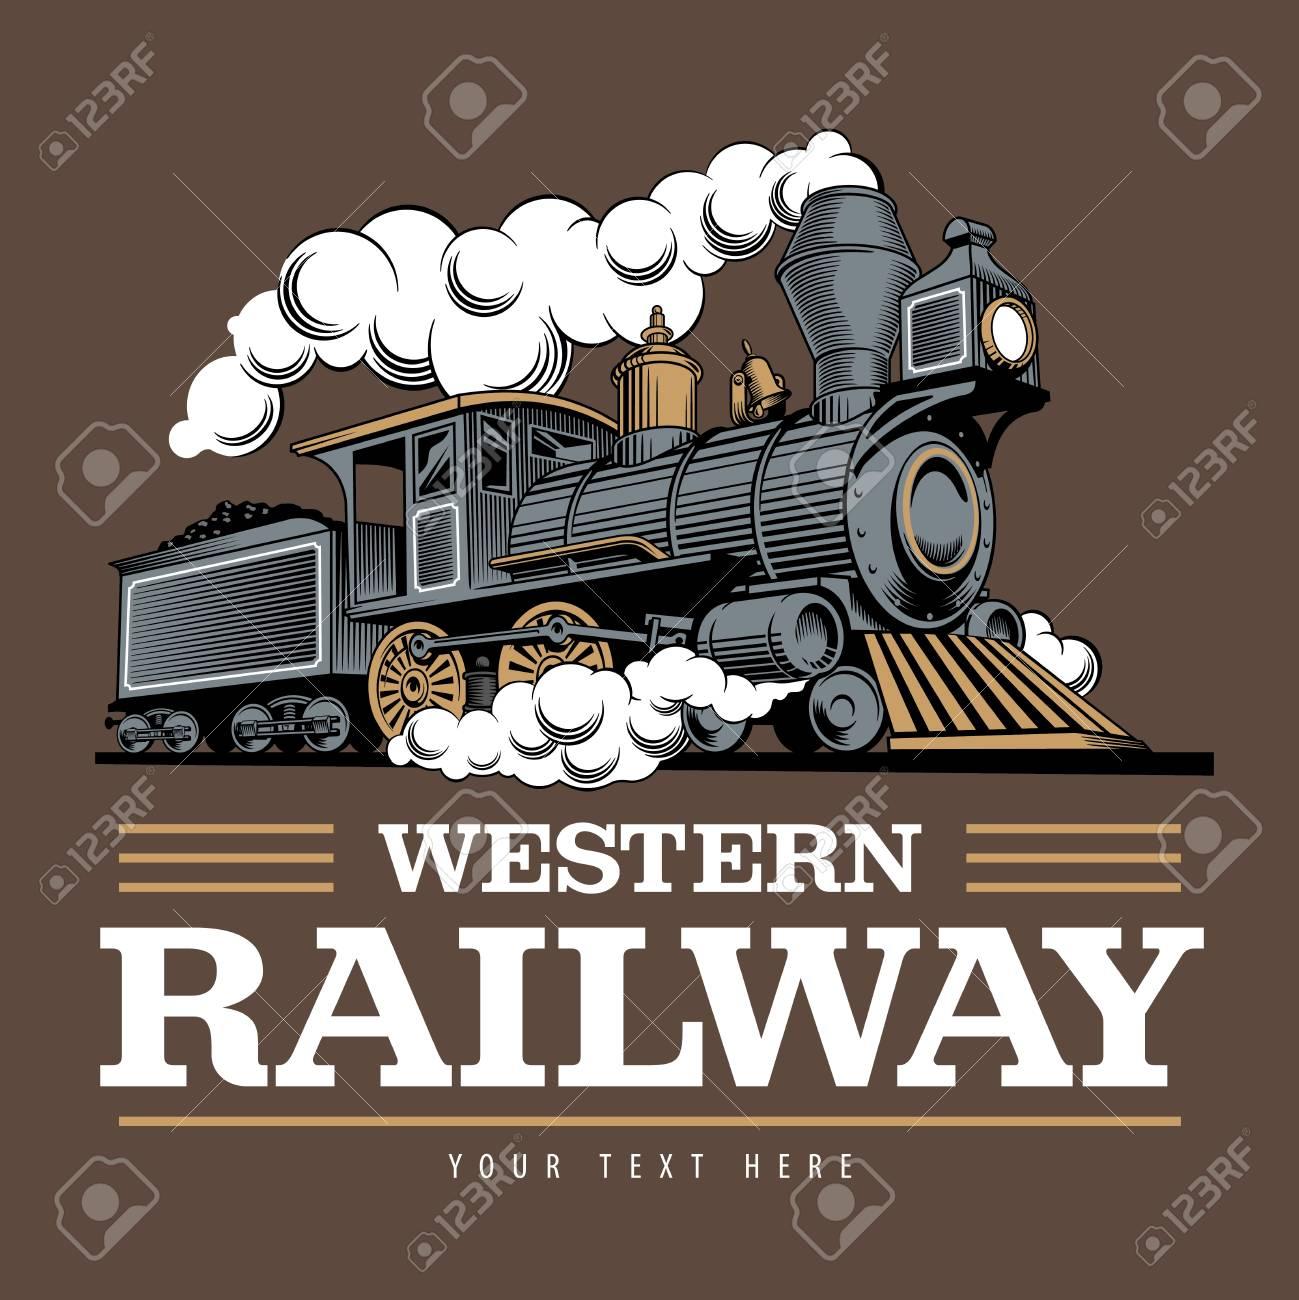 Vintage steam train locomotive, engraving style vector illustration. On brown background. Logo design template. - 119865822